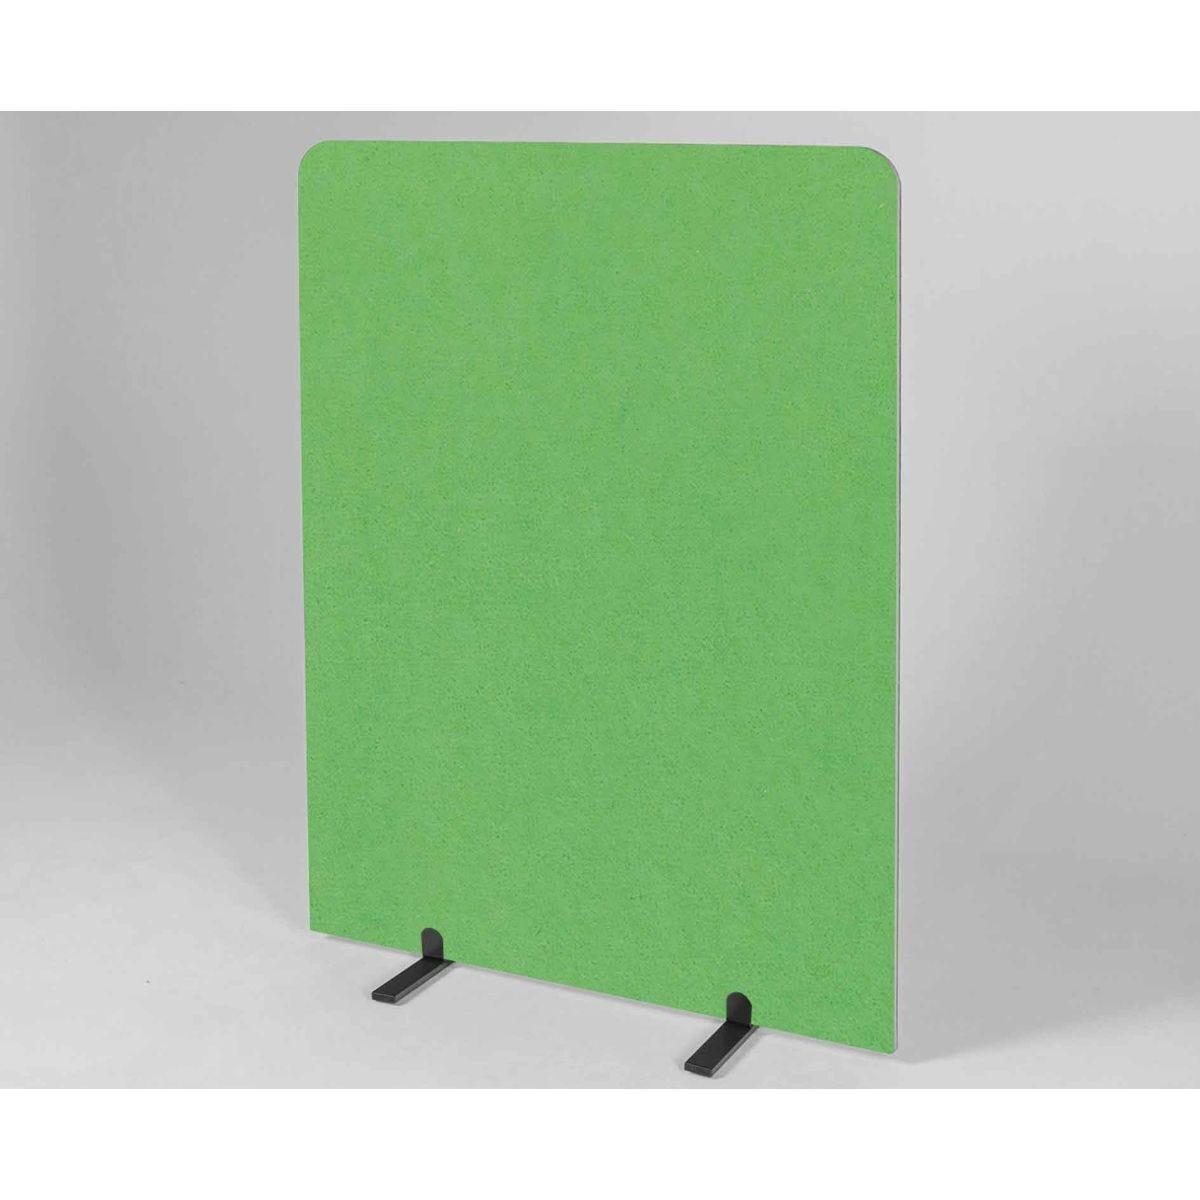 Metroplan BusyScreen Curve Screen 1600 x 1200mm Apple Green